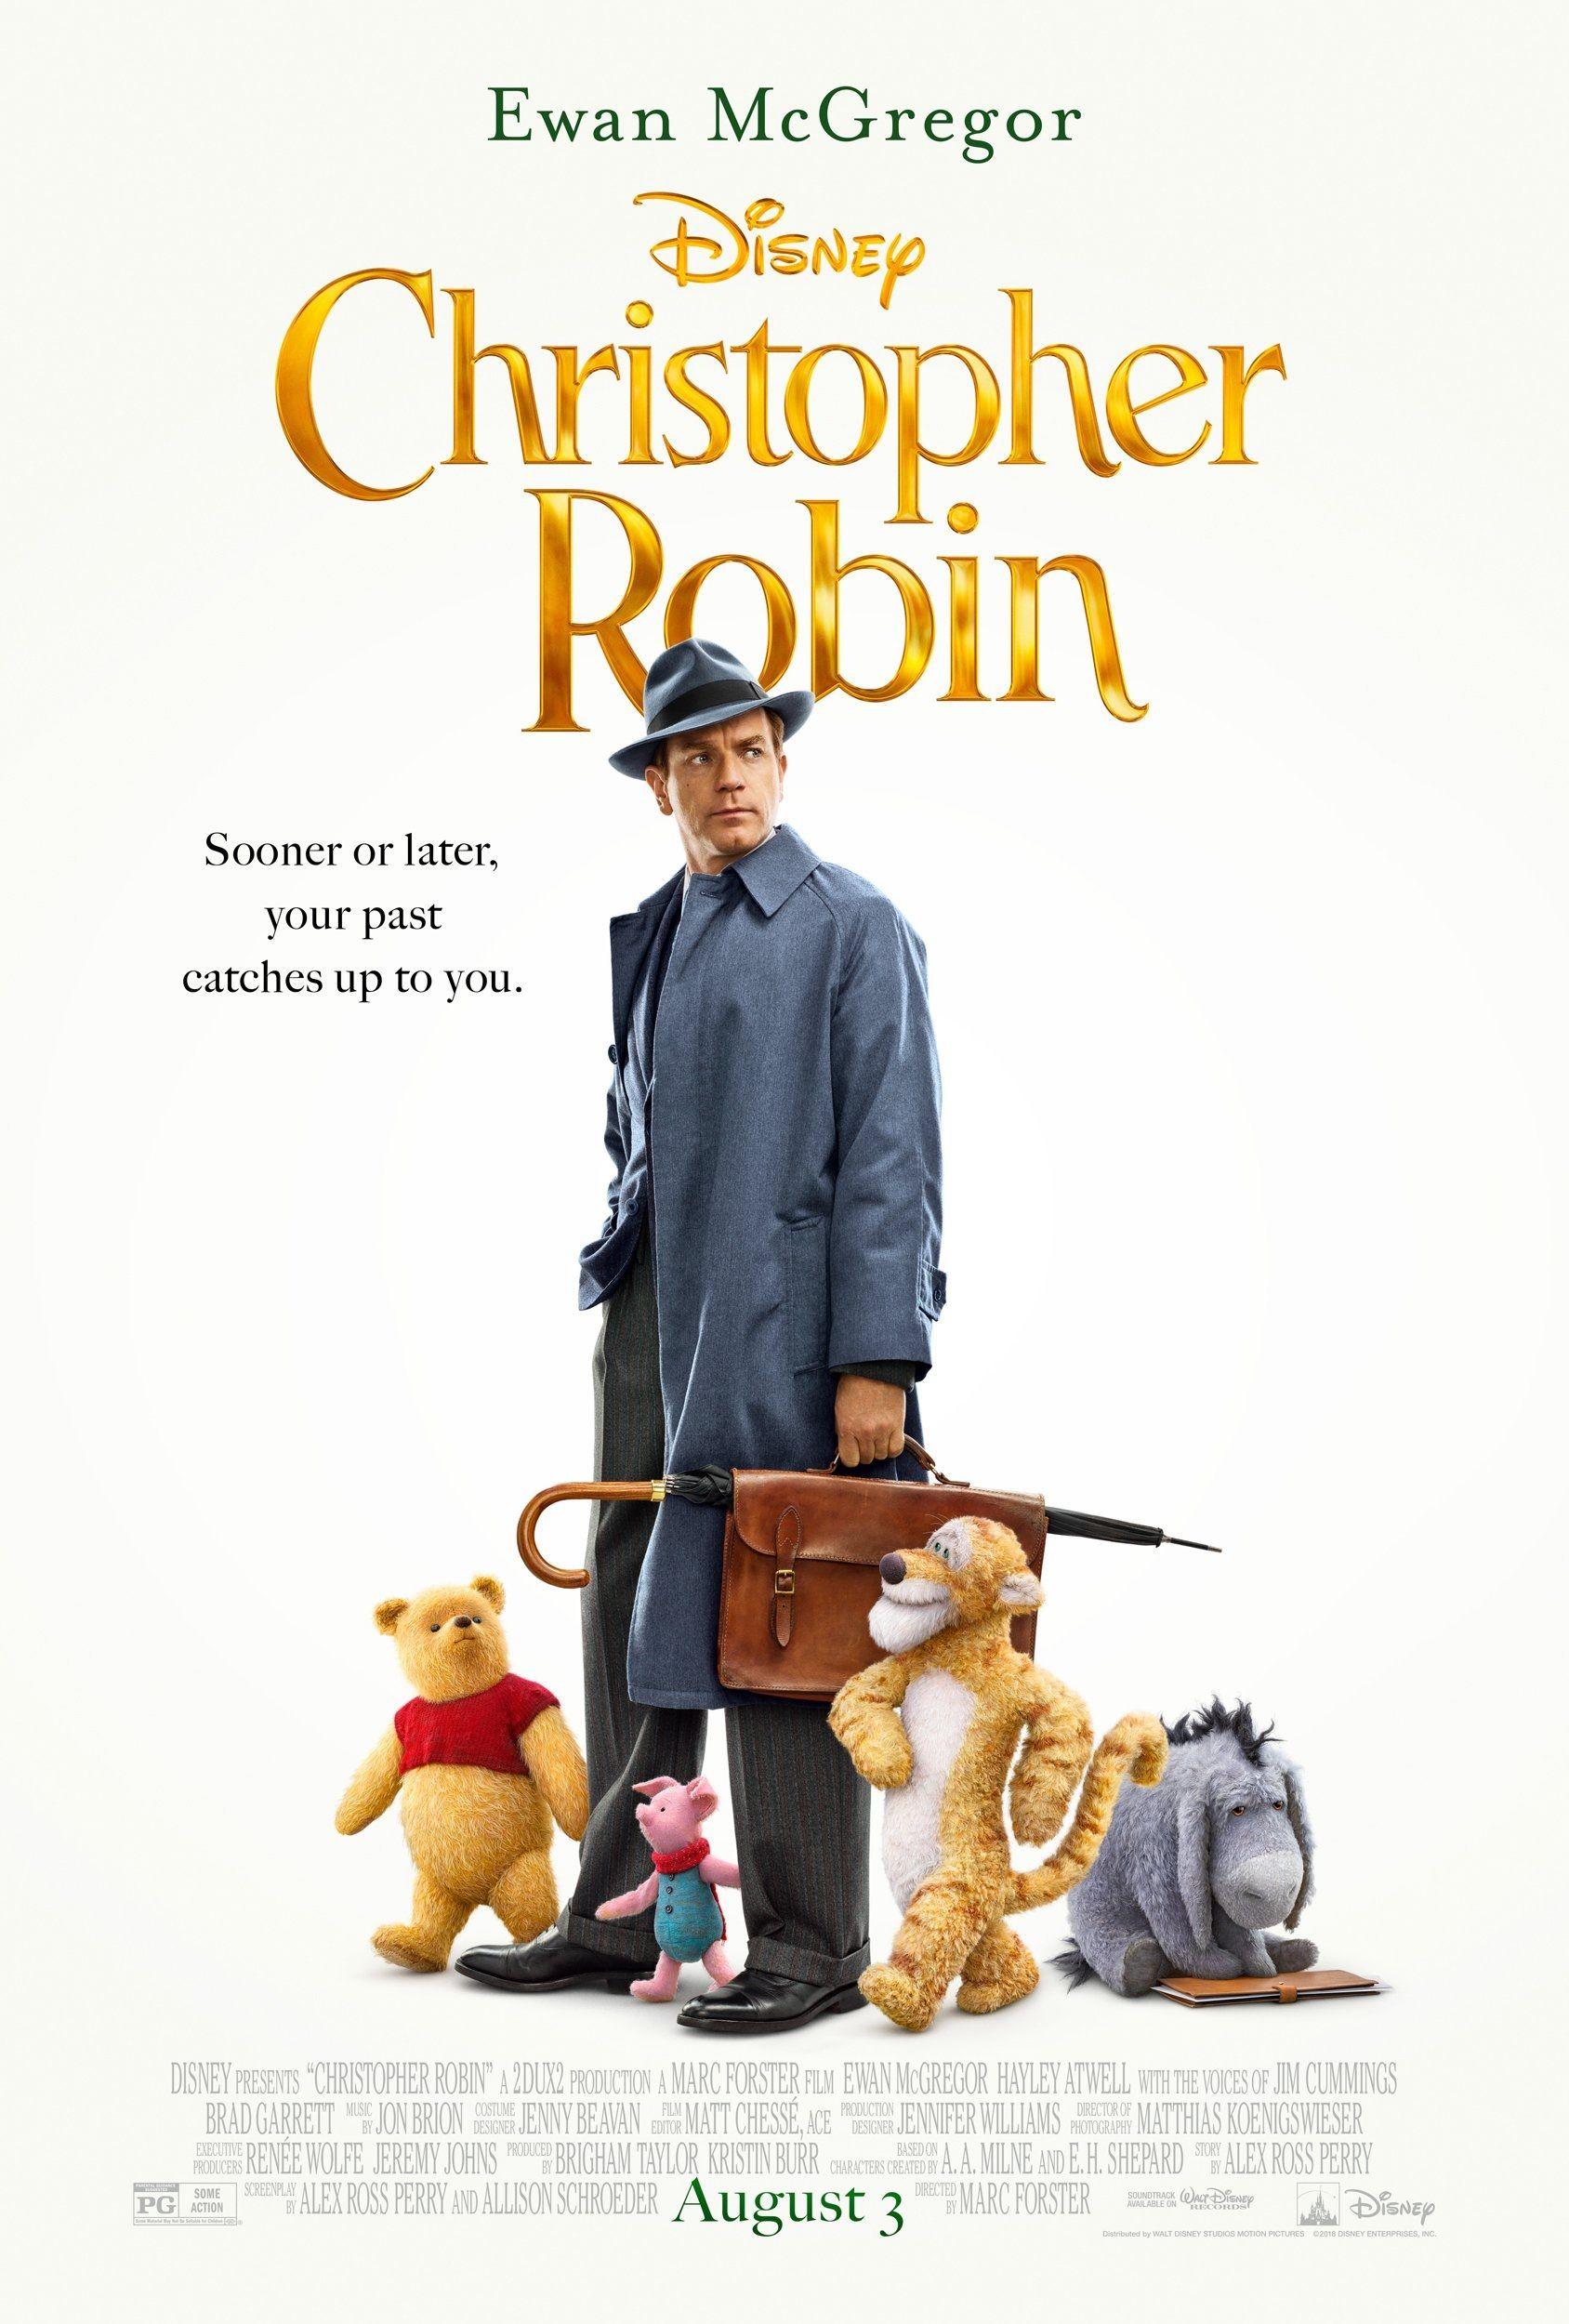 Disney's Christopher Robin Movie Poster